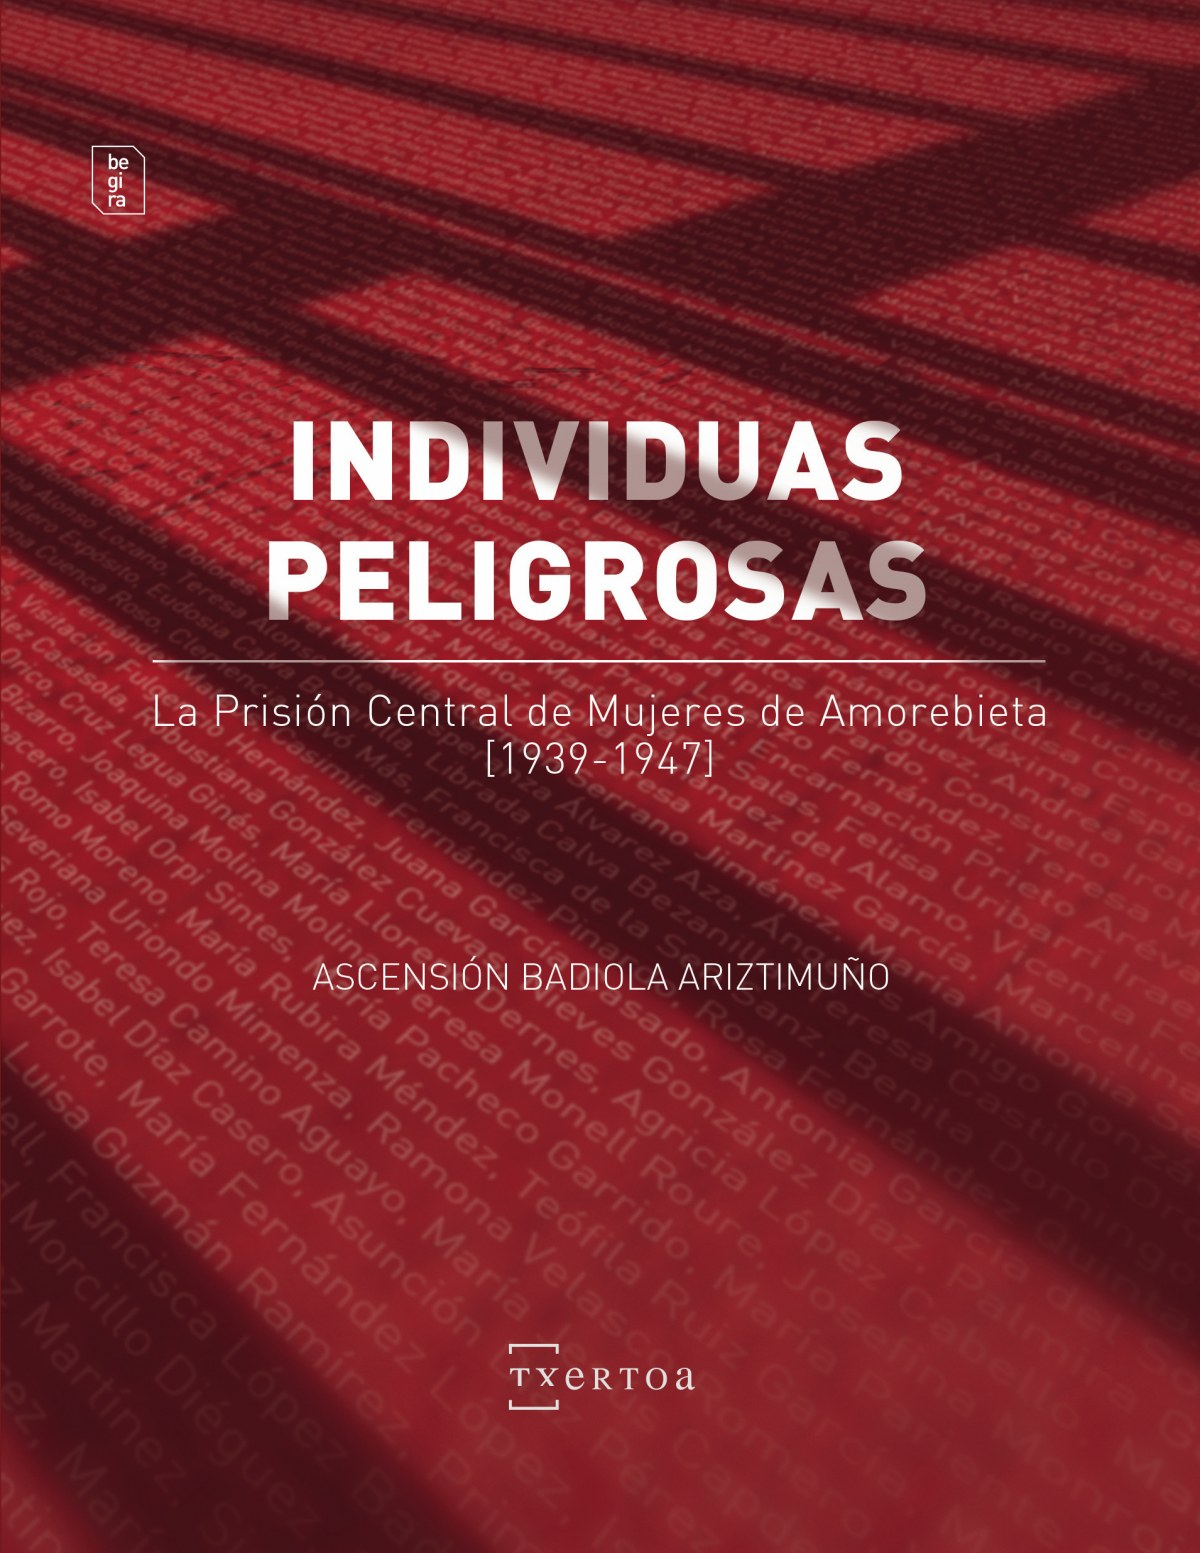 INDIVIDUAS PELIGROSAS 9788471486301